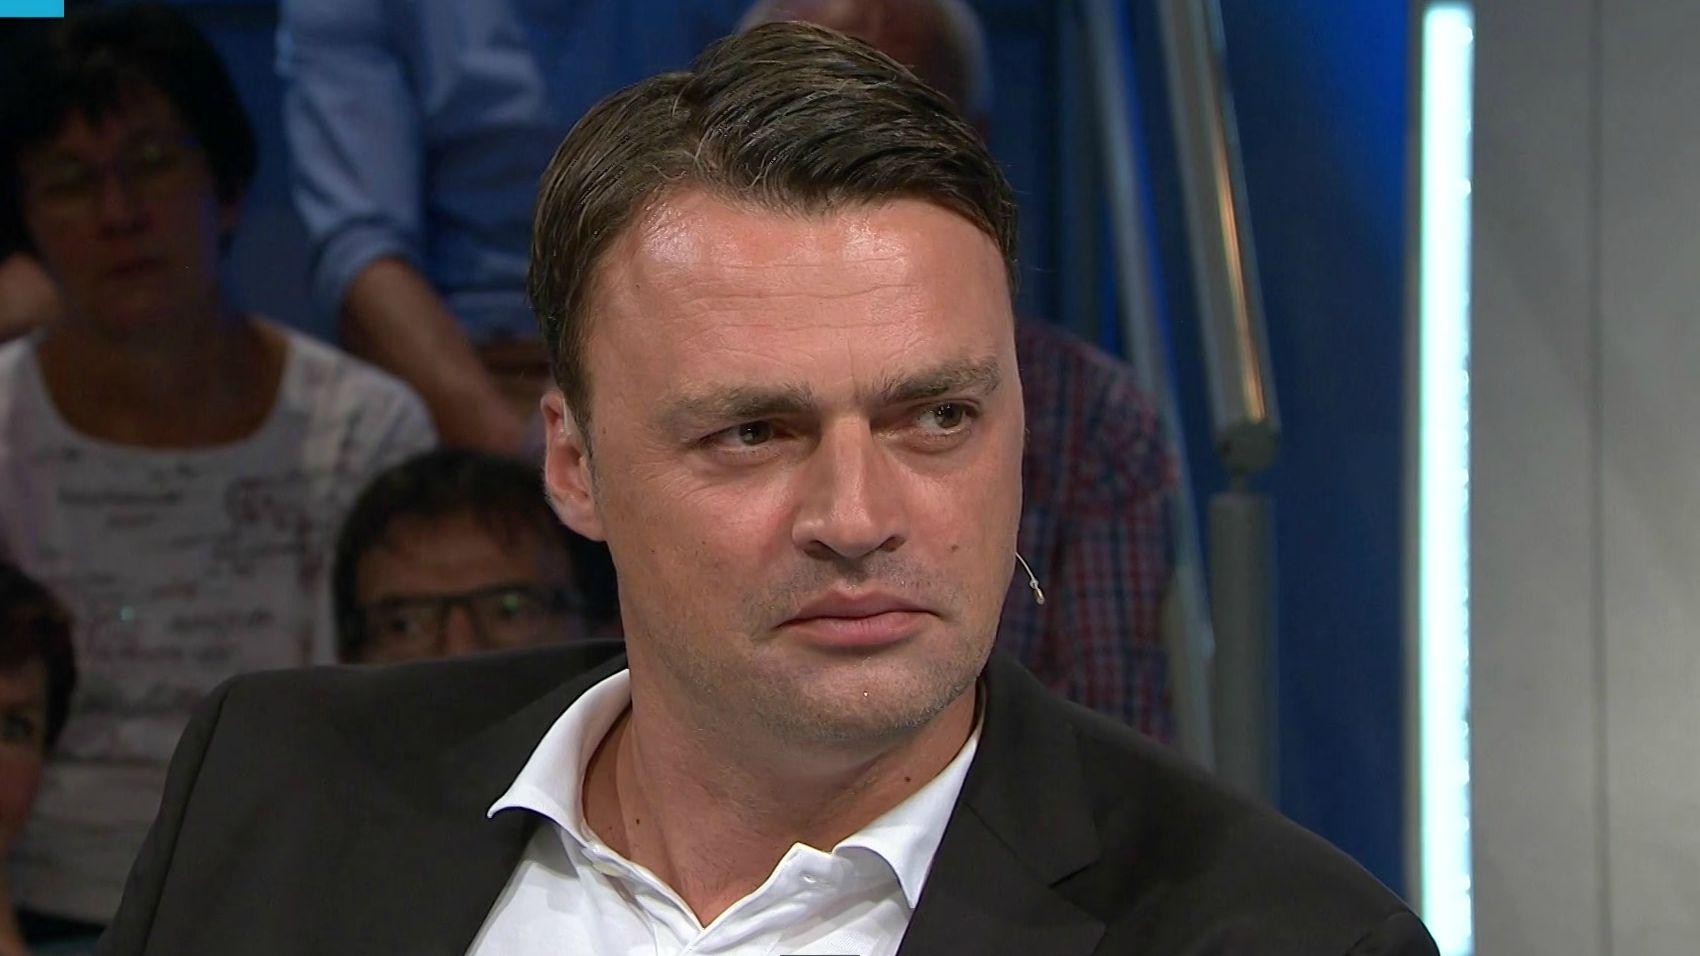 Robert Palikuca, Sportvorstand des 1.FC Nürnberg zu Gast in Blickpunkt Sport